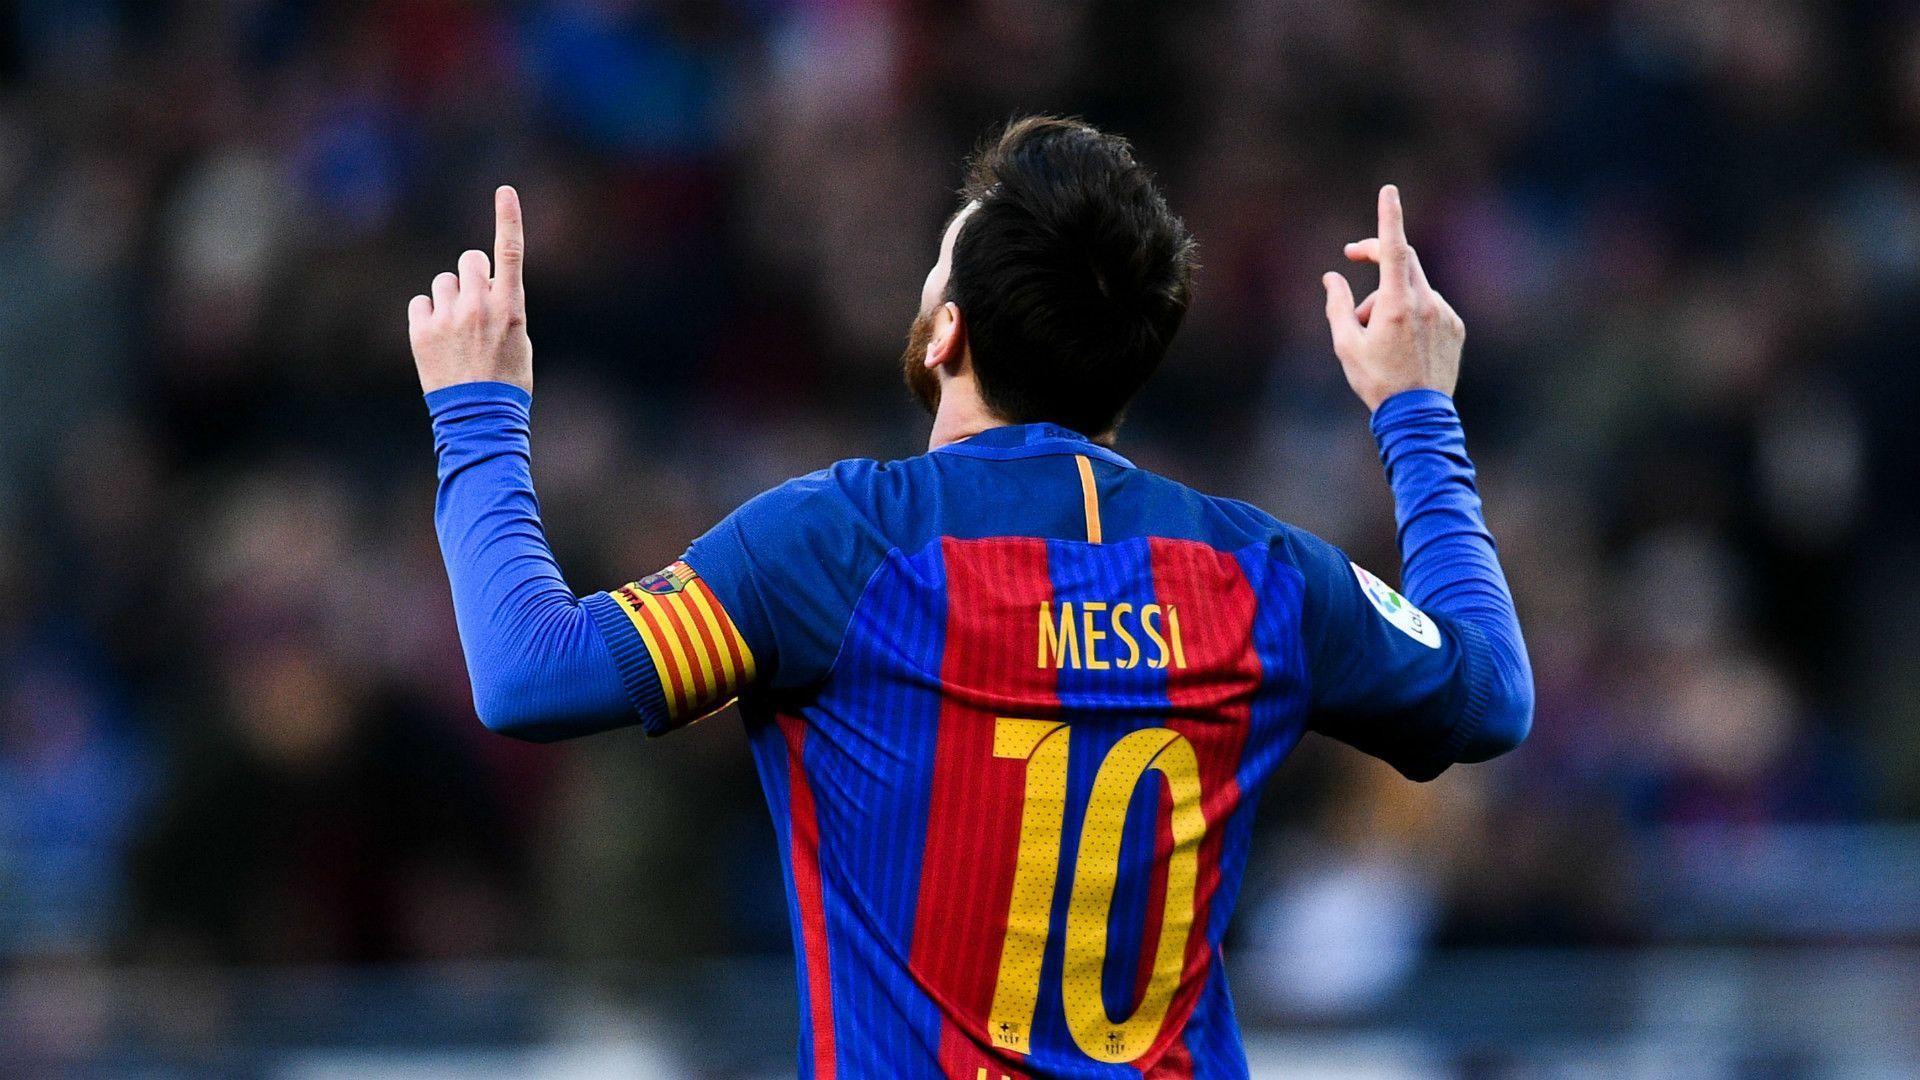 Wallpapers Messi 4k